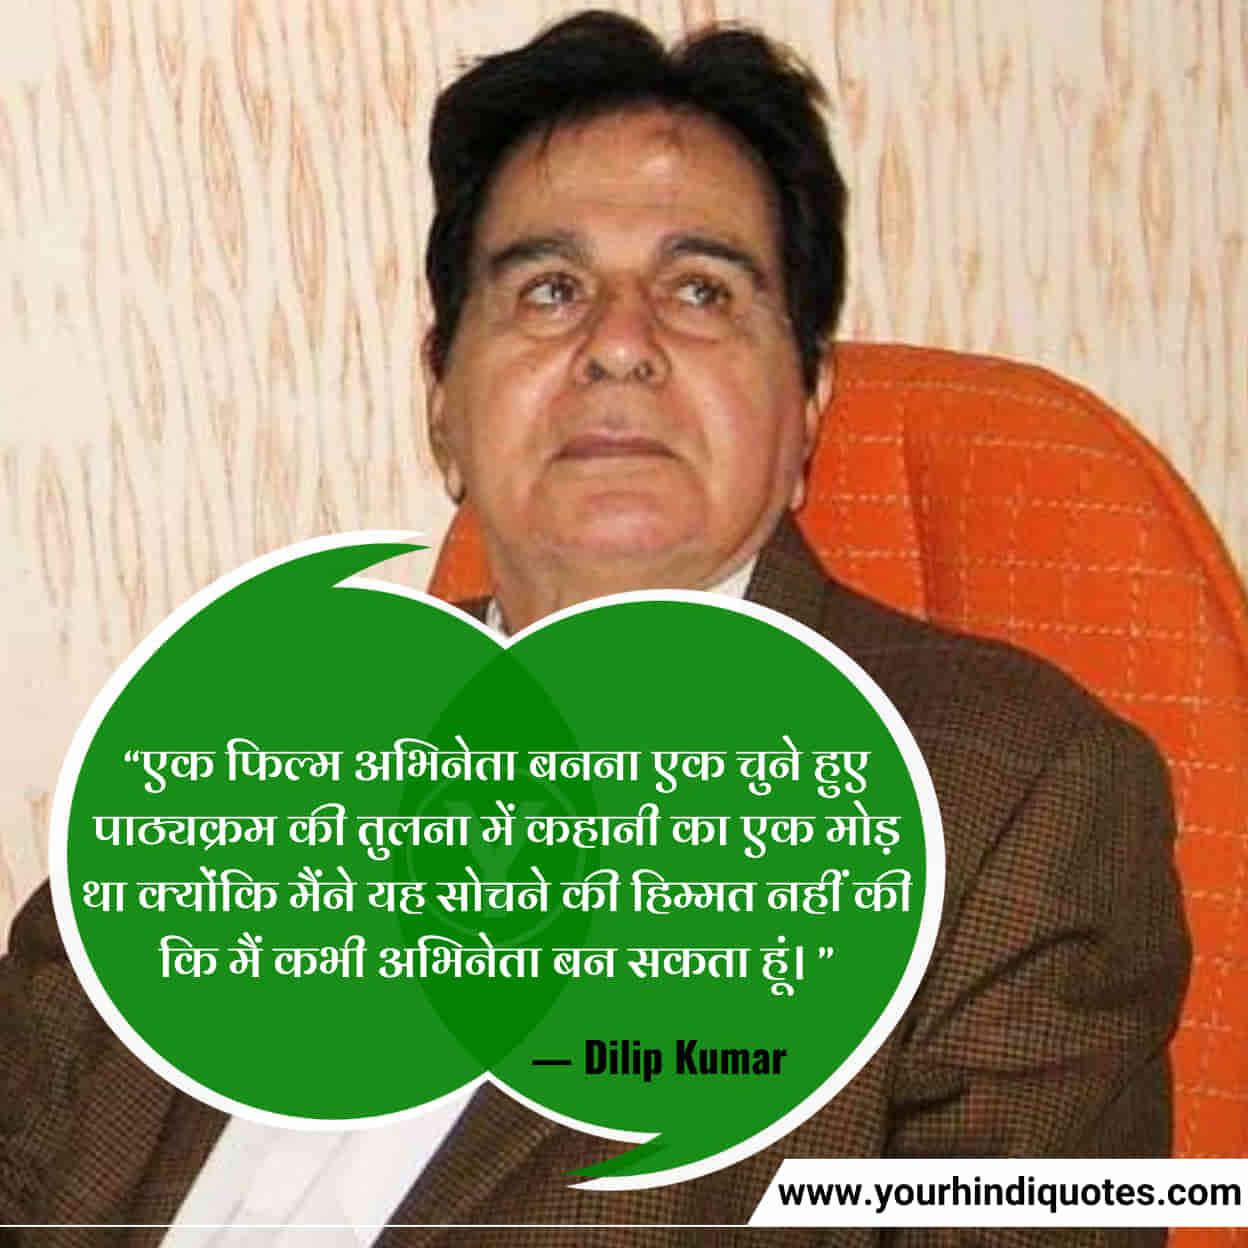 Dilip Kumar Best Quotes